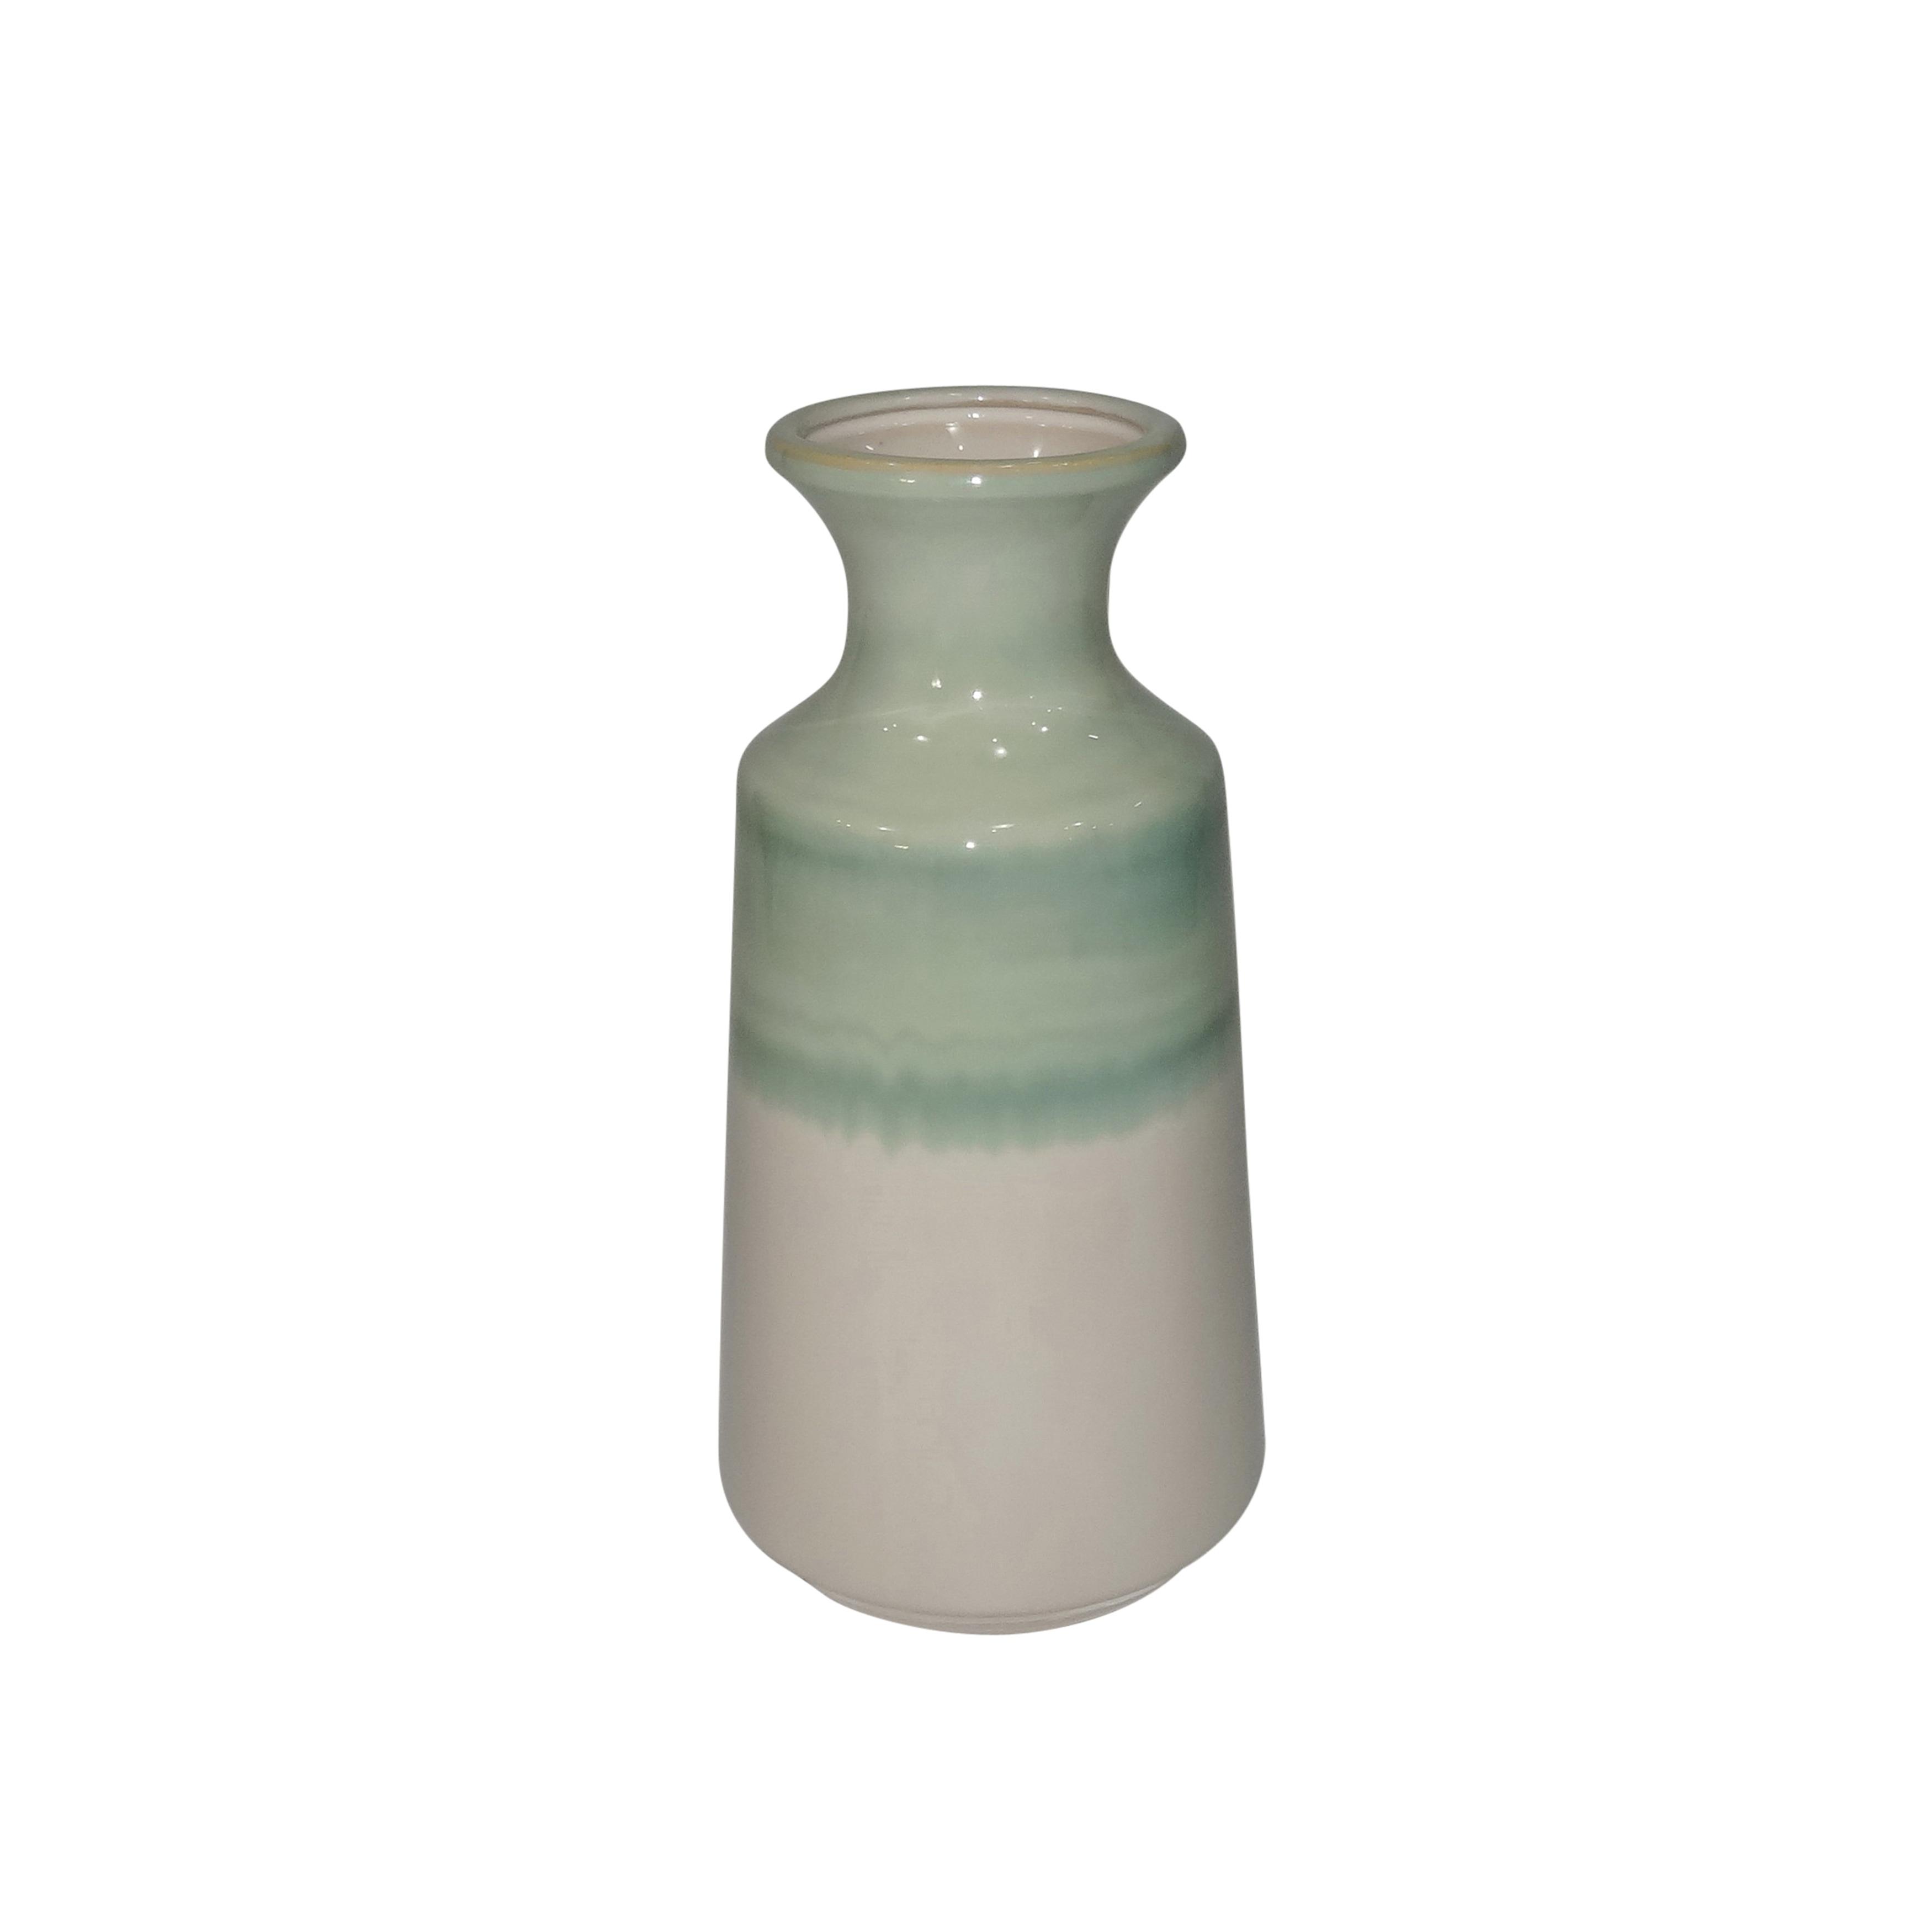 Dual Tone Ceramic Vase with Round Opening, Medium, Green and White